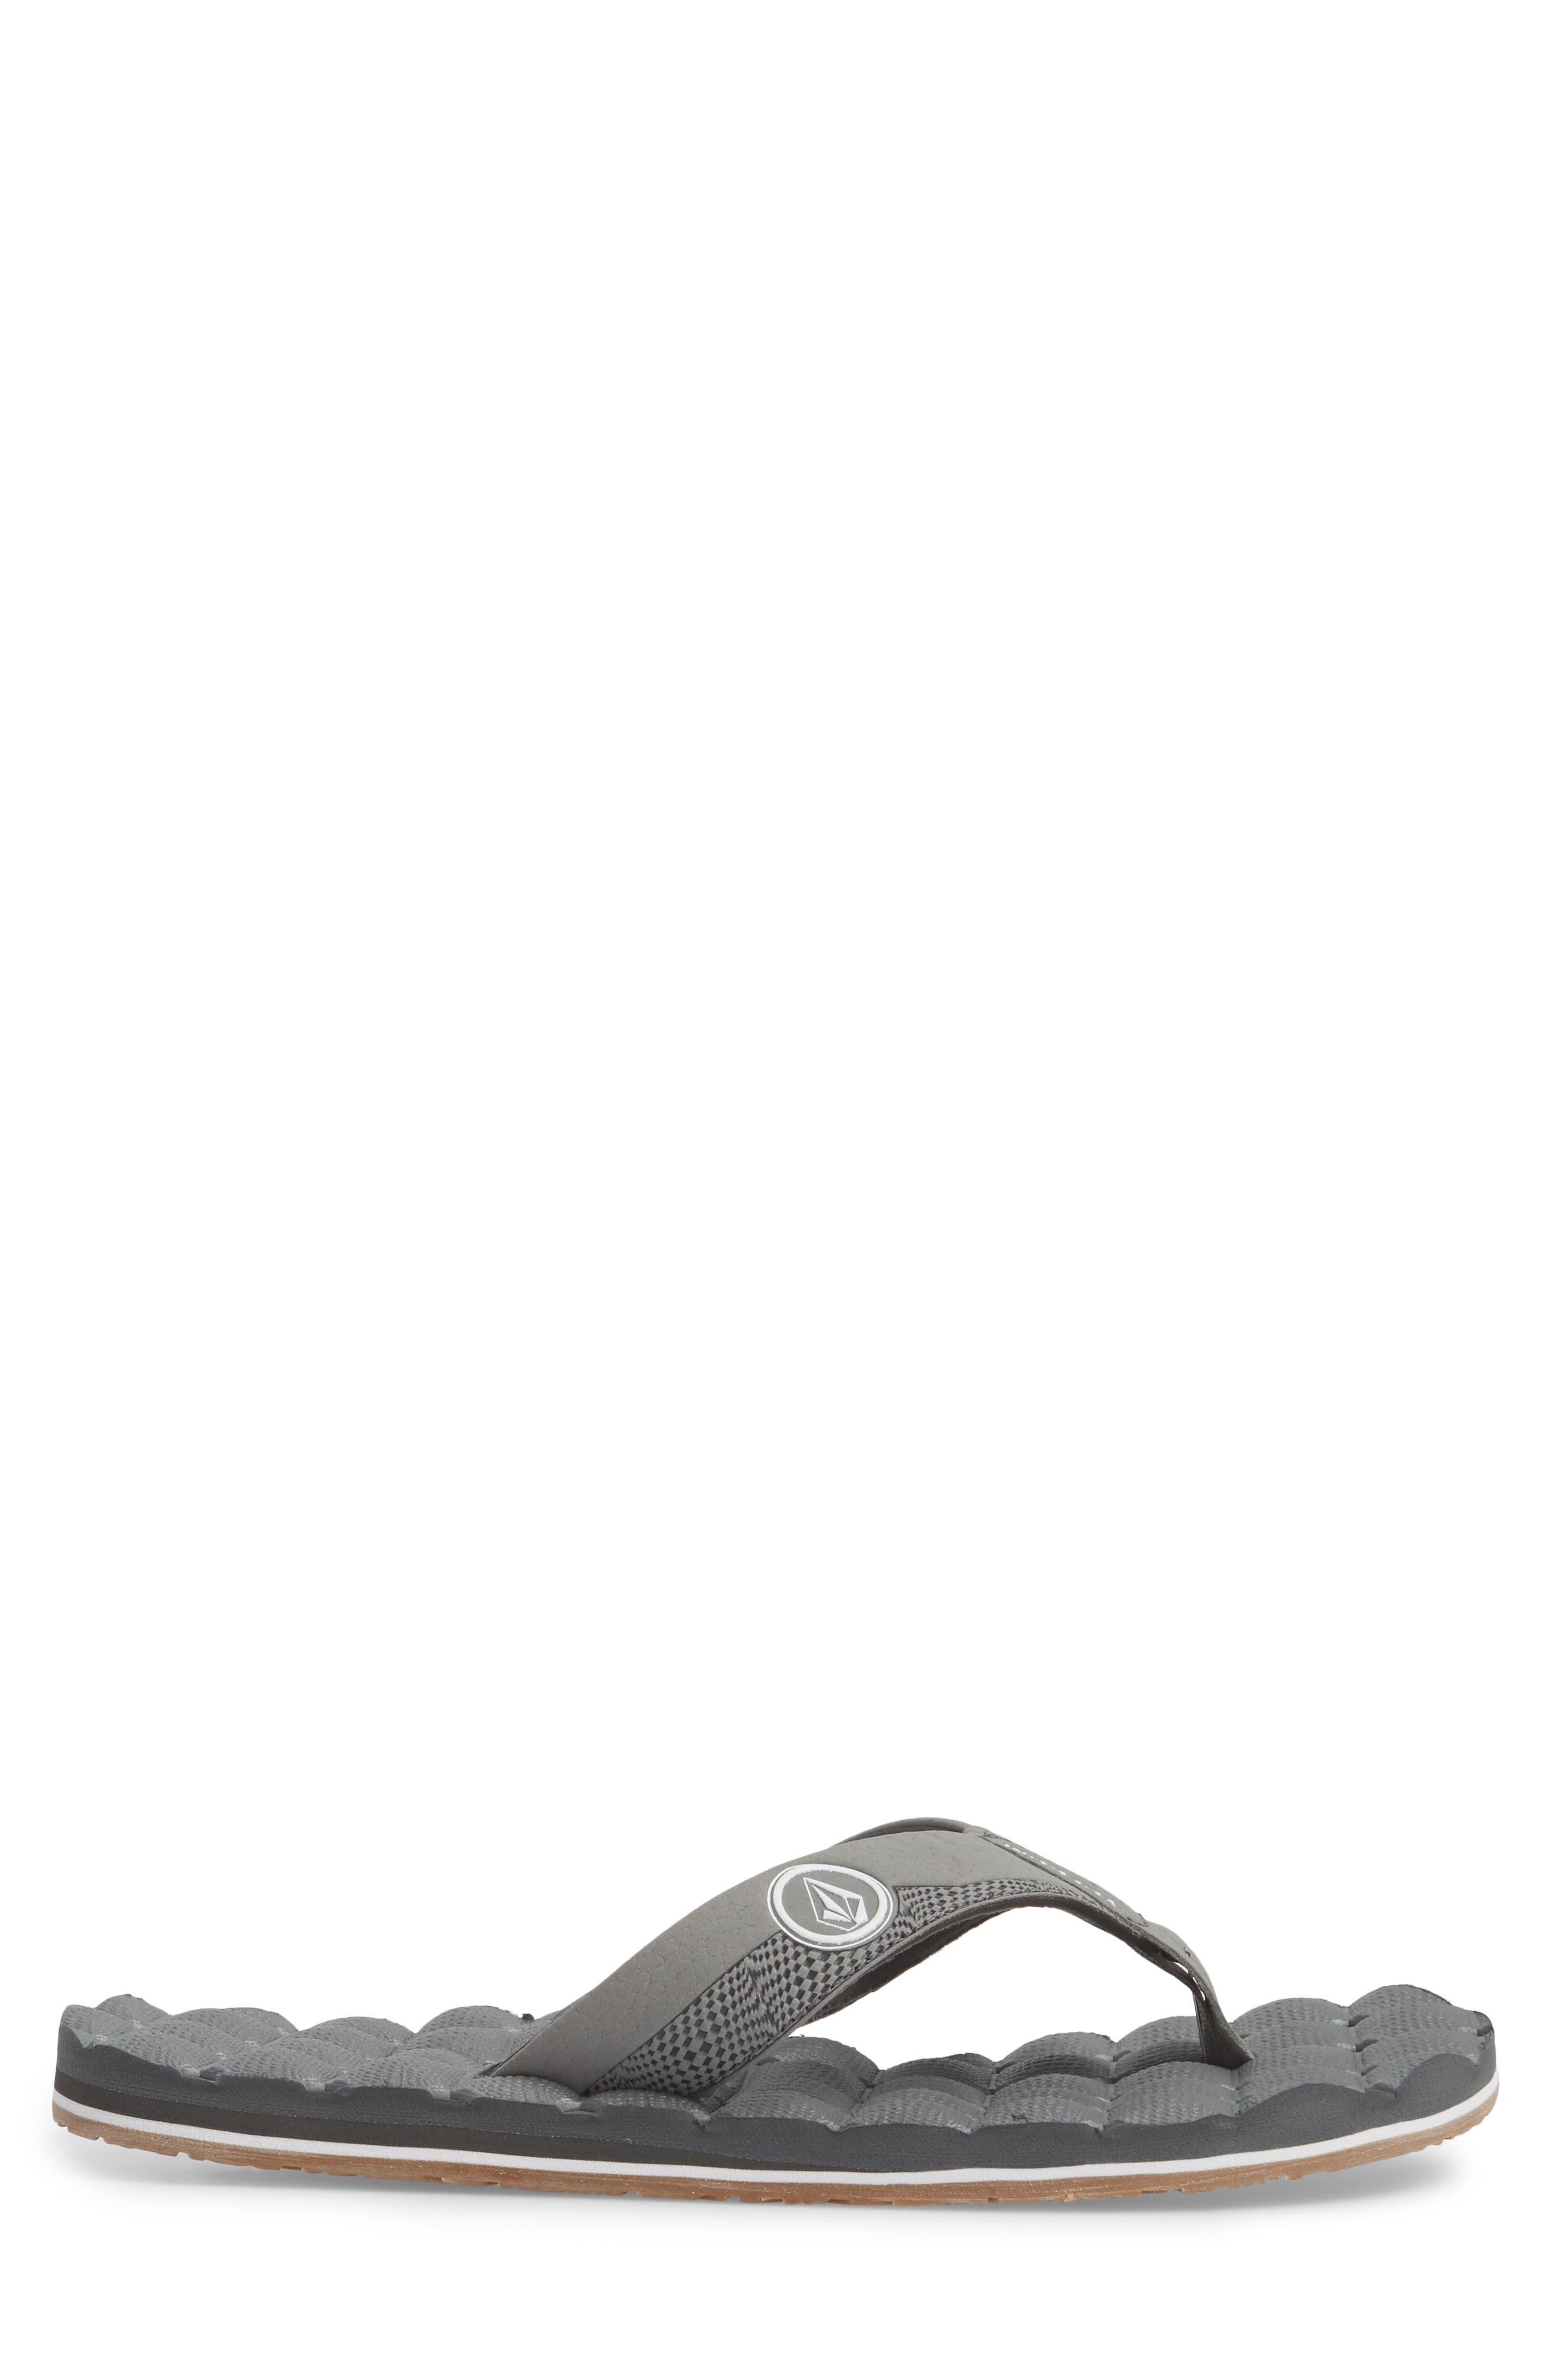 'Recliner' Flip Flop,                             Alternate thumbnail 3, color,                             Light Grey